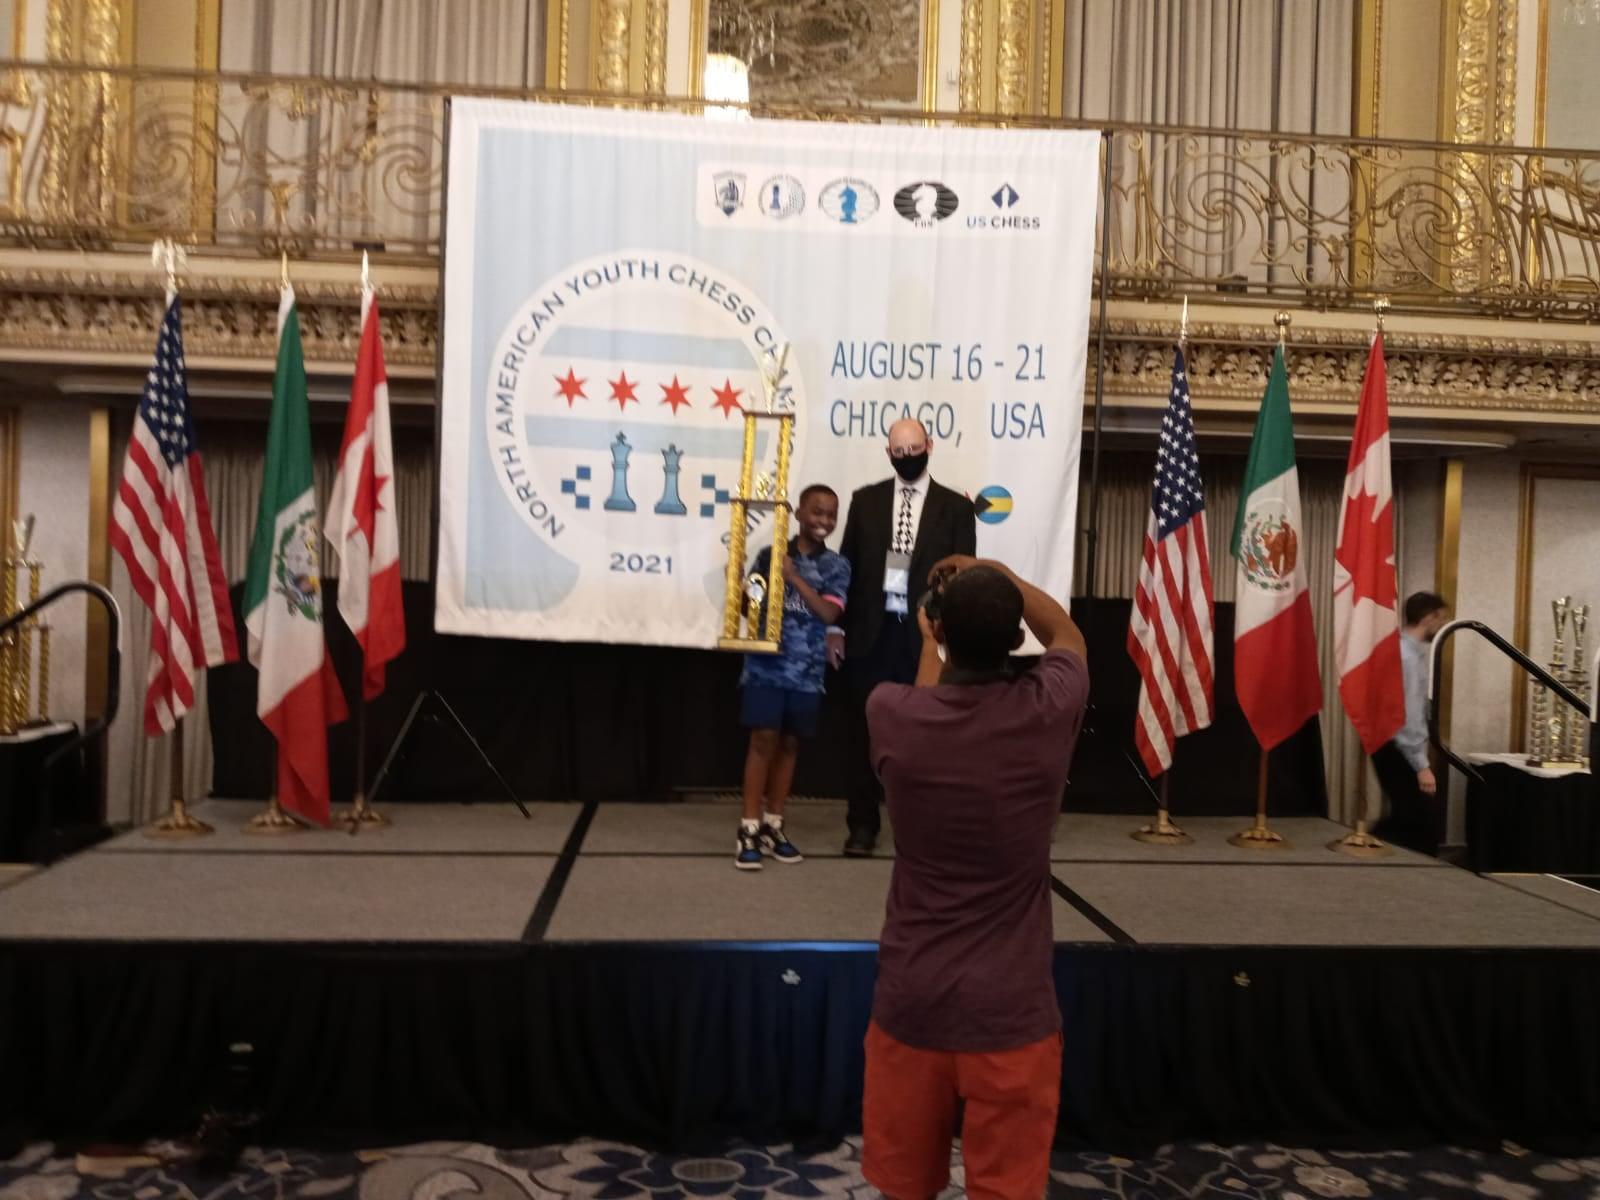 Tani Adewumi winning under-12 at North American Youth Chess Championships. Photo by Kayodo Adewumi